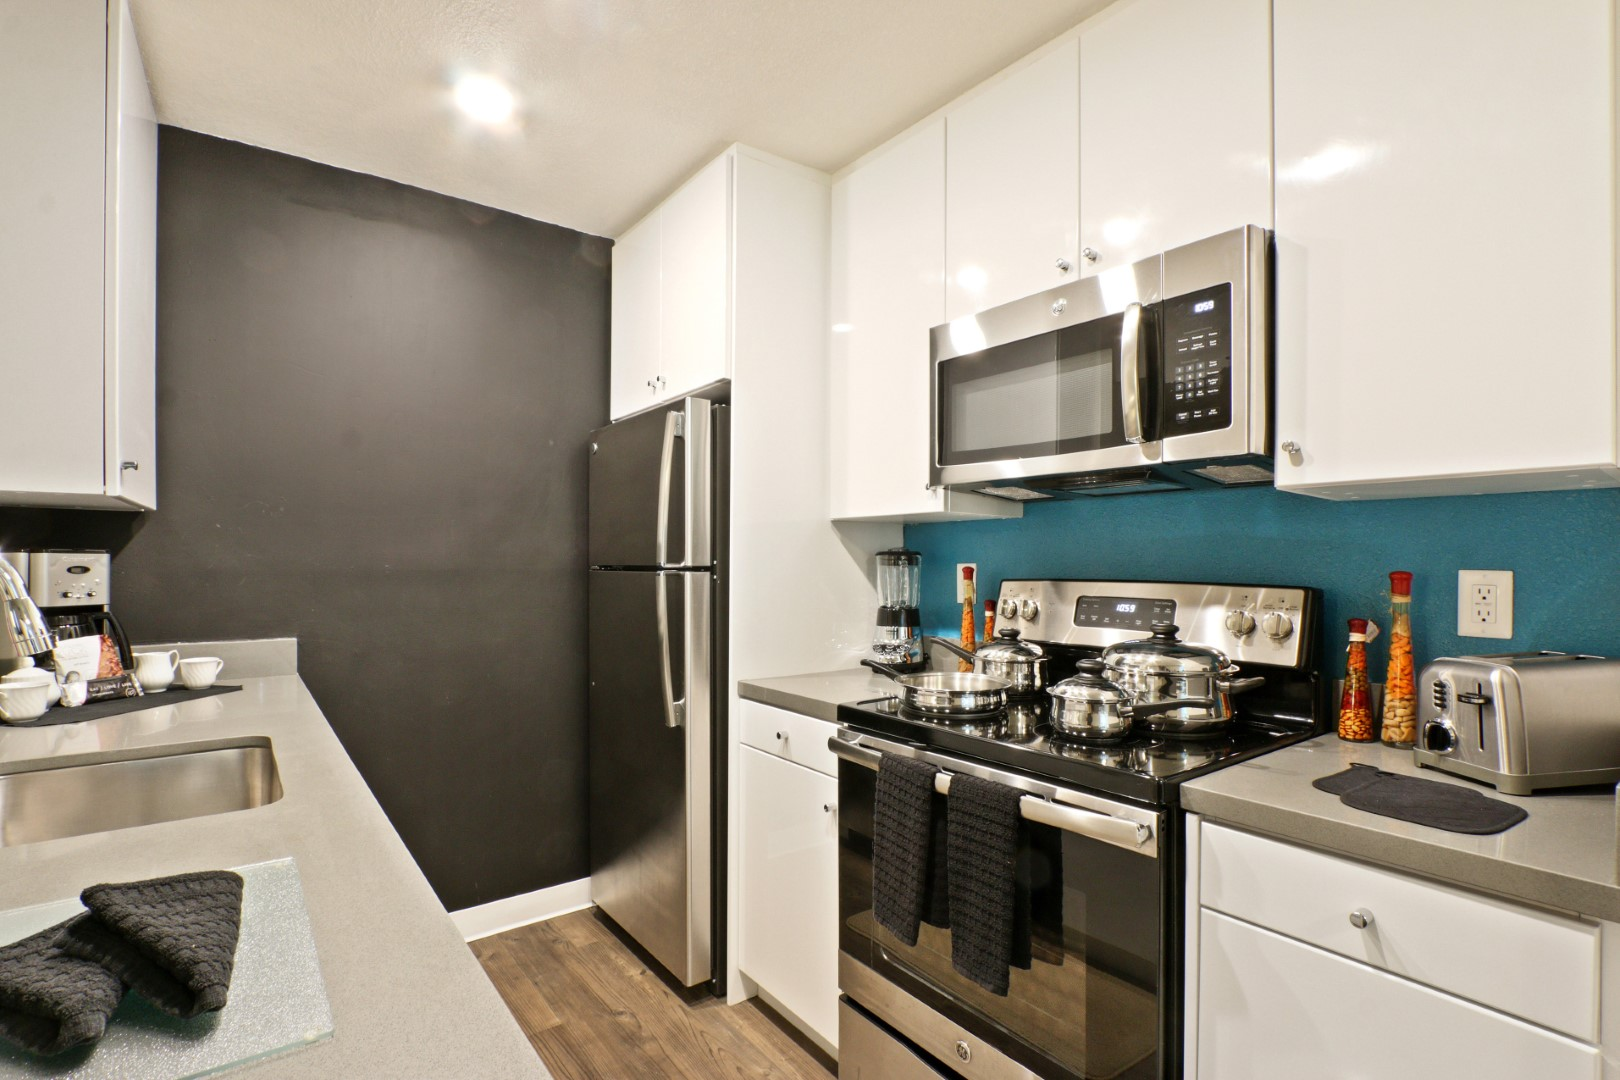 Kitchen at Ava Toluca Hills Apartments, Toluca Lake, Los Angeles